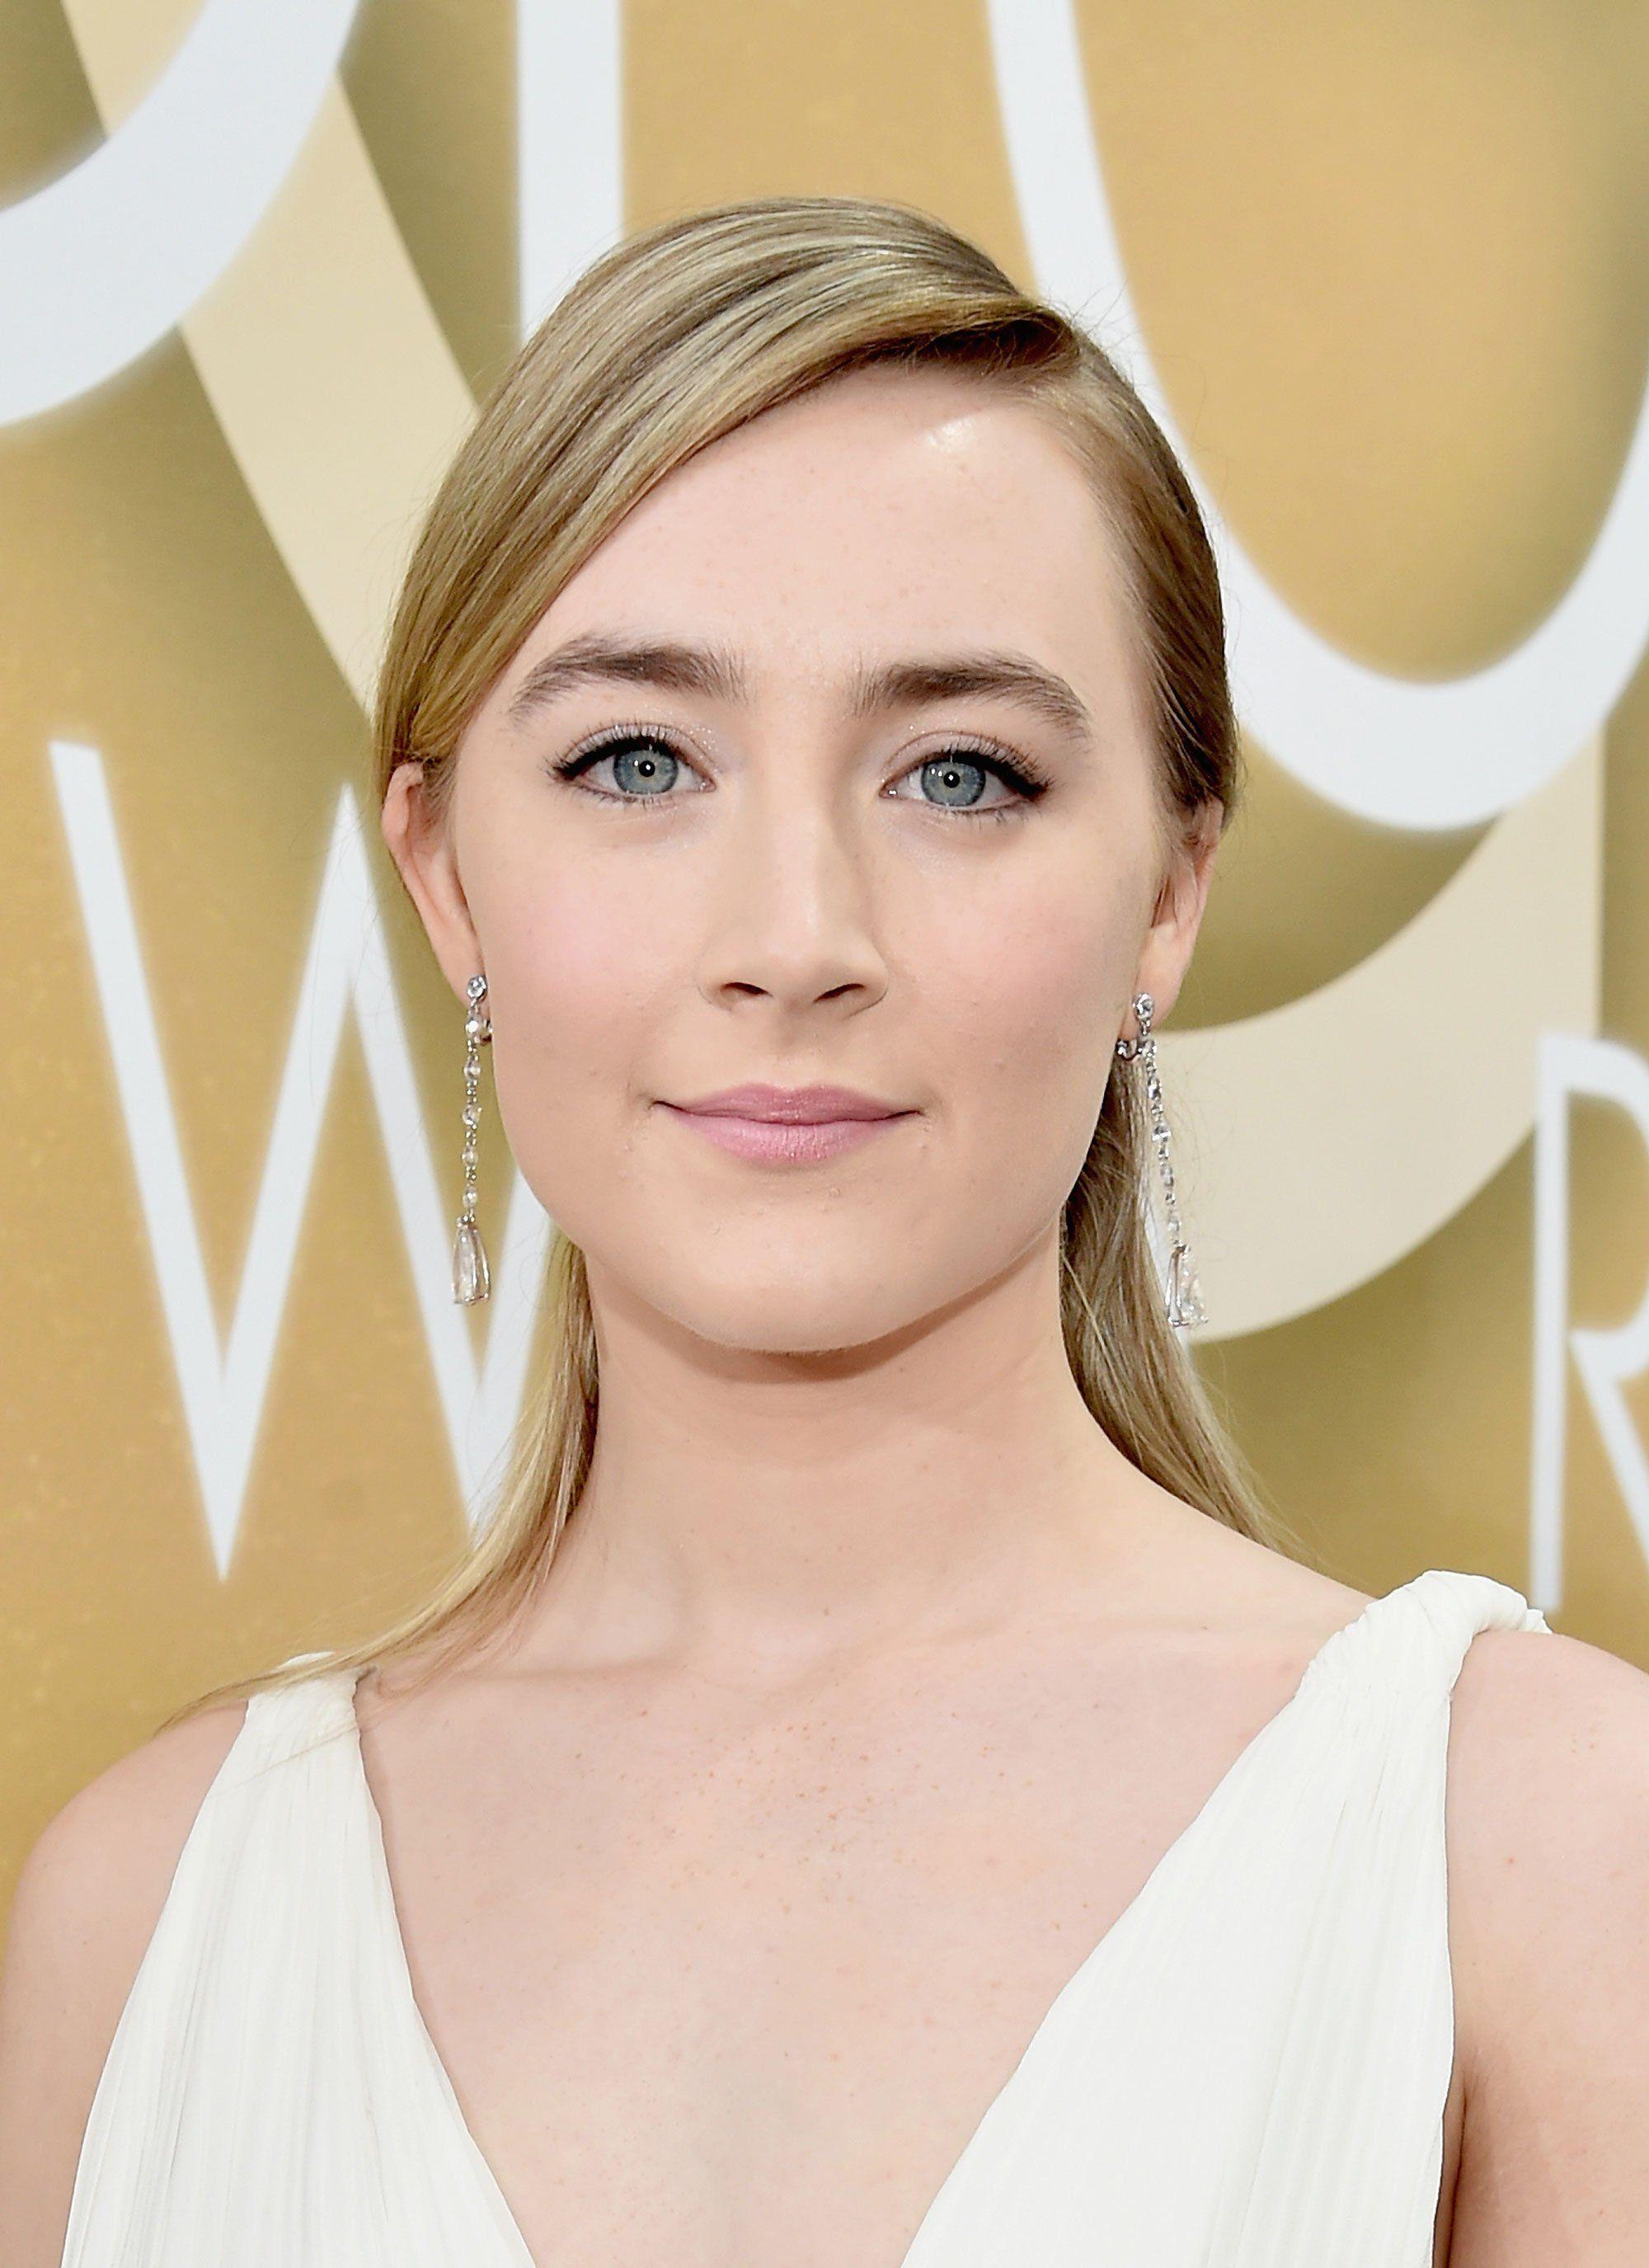 Saoirse Ronan in #Chopard jewels - 2016 Golden Globes Awards Red Carpet - January 10, 2016